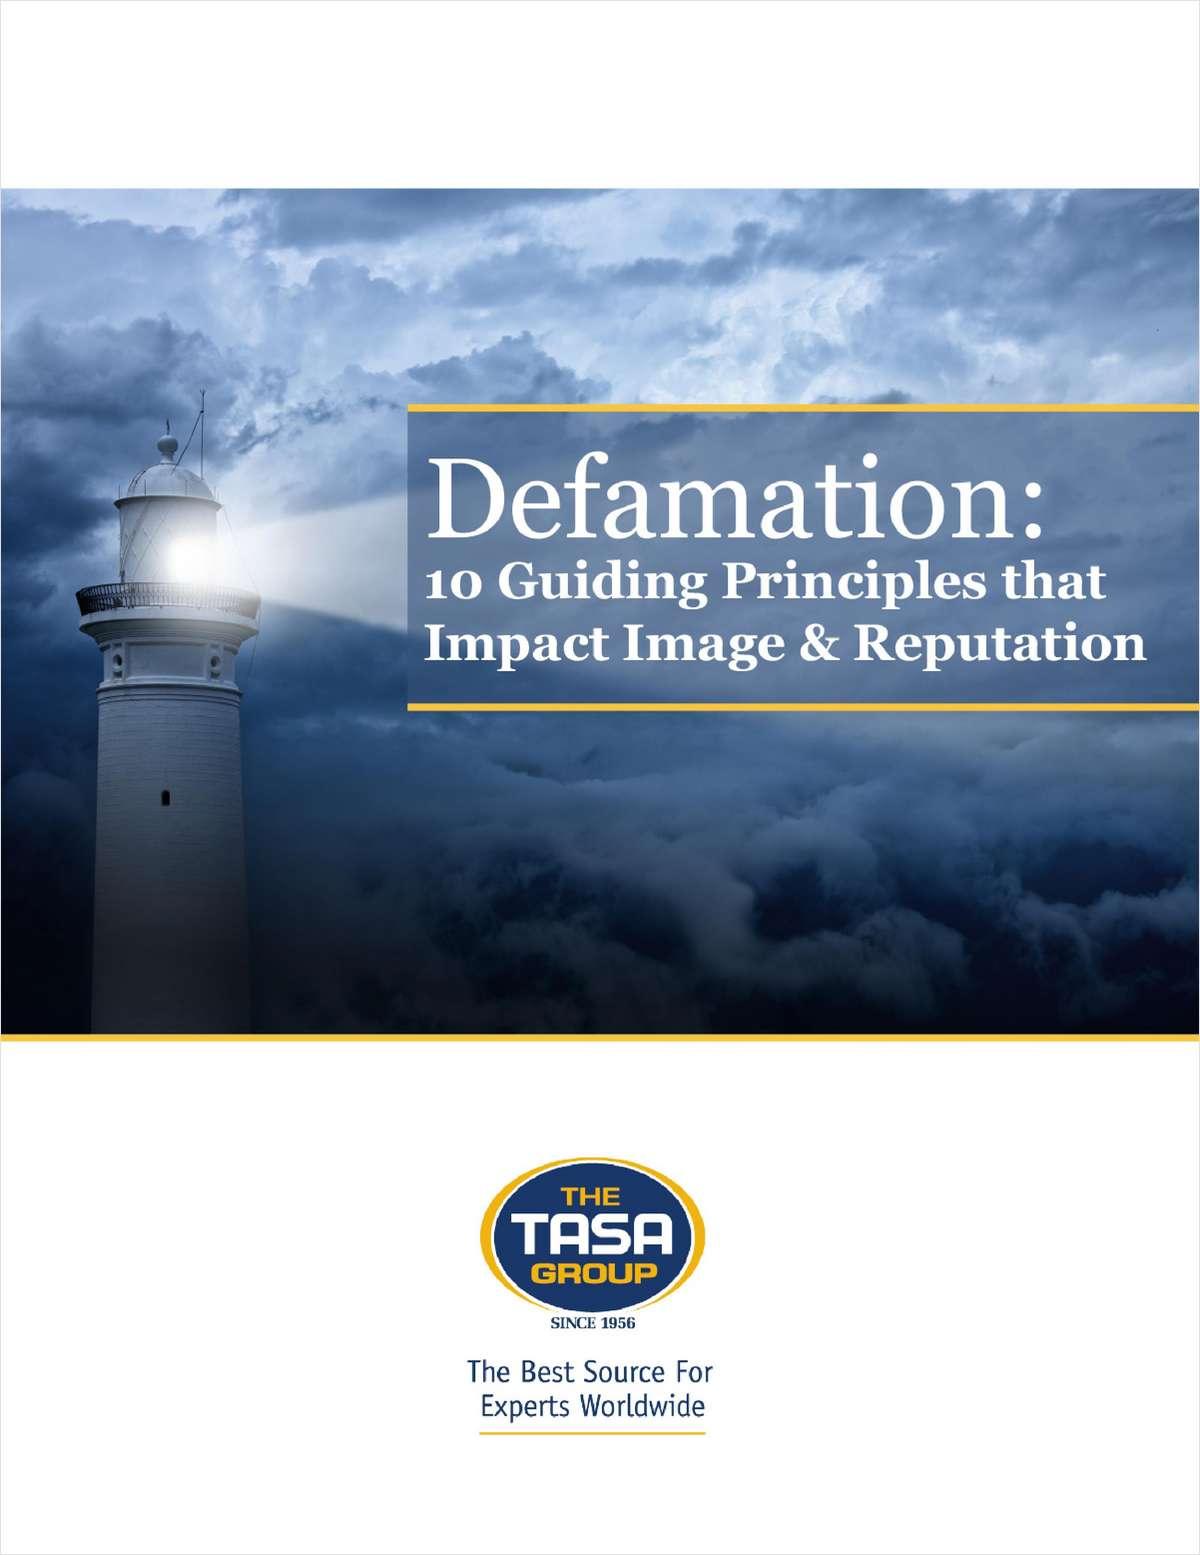 Defamation: 10 Guiding Principles that Impact Image & Reputation